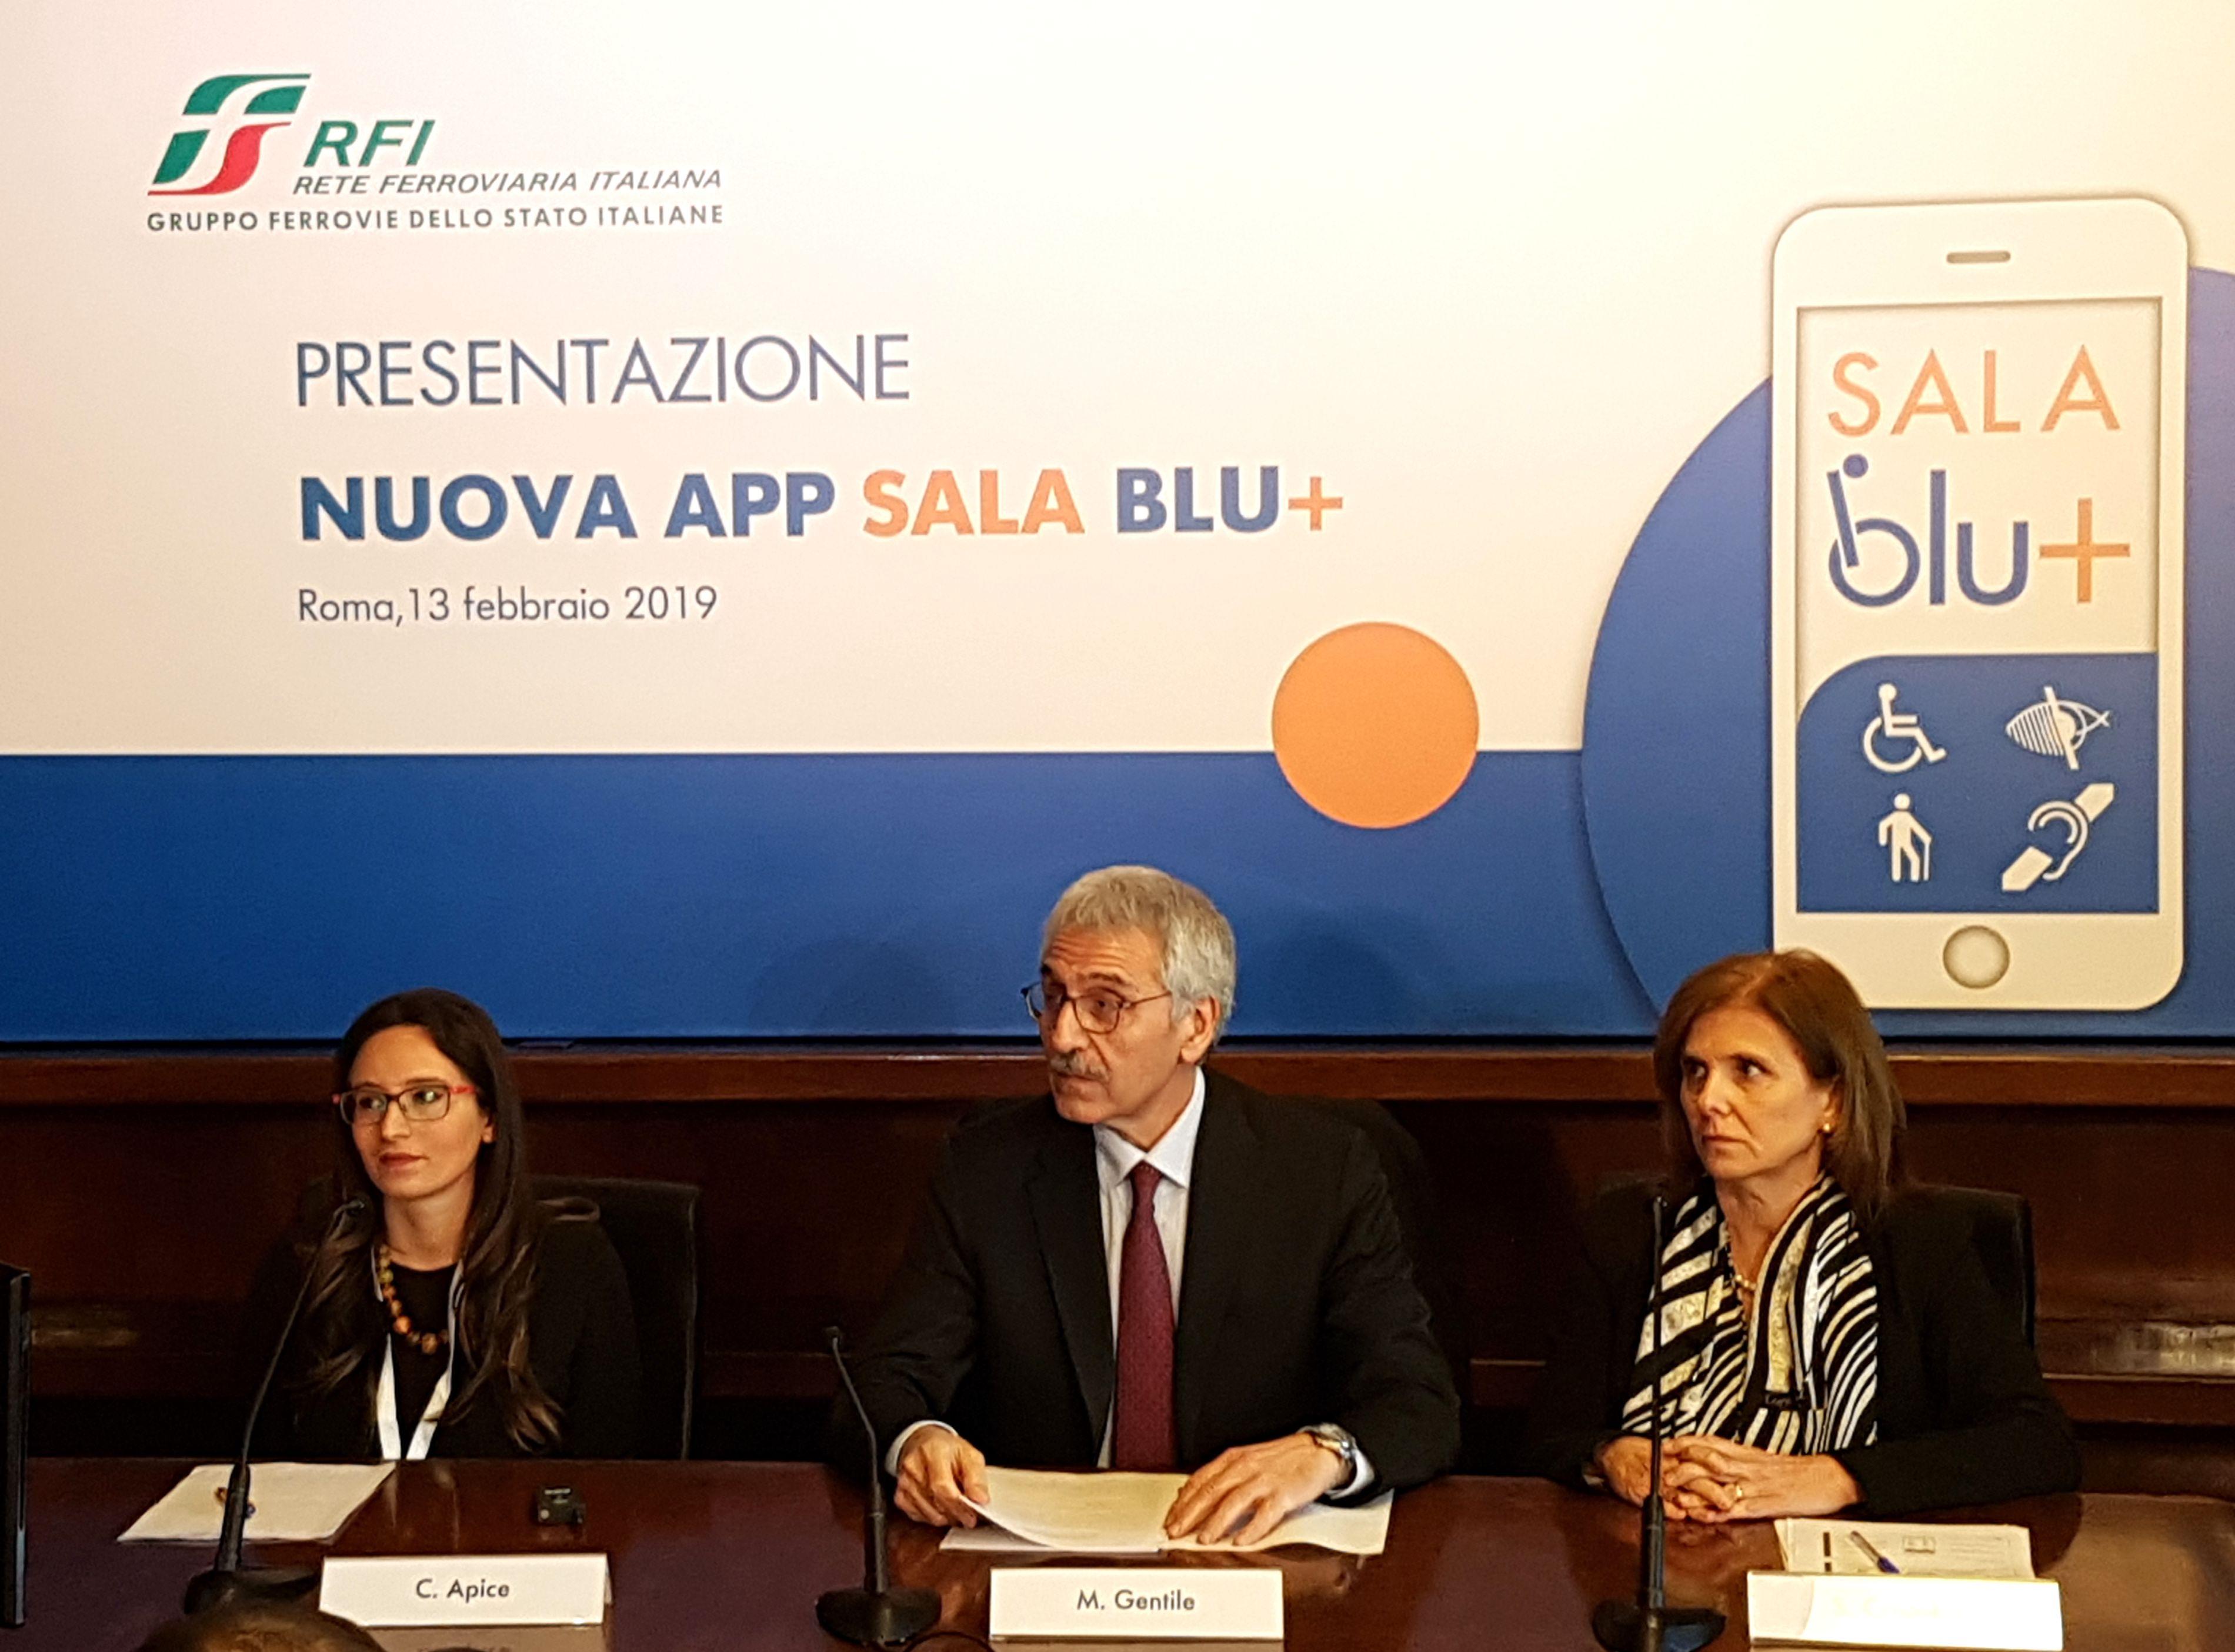 Sale Blu Ferrovie : Europe journal u2013 rete ferroviaria italiana presenta due importanti